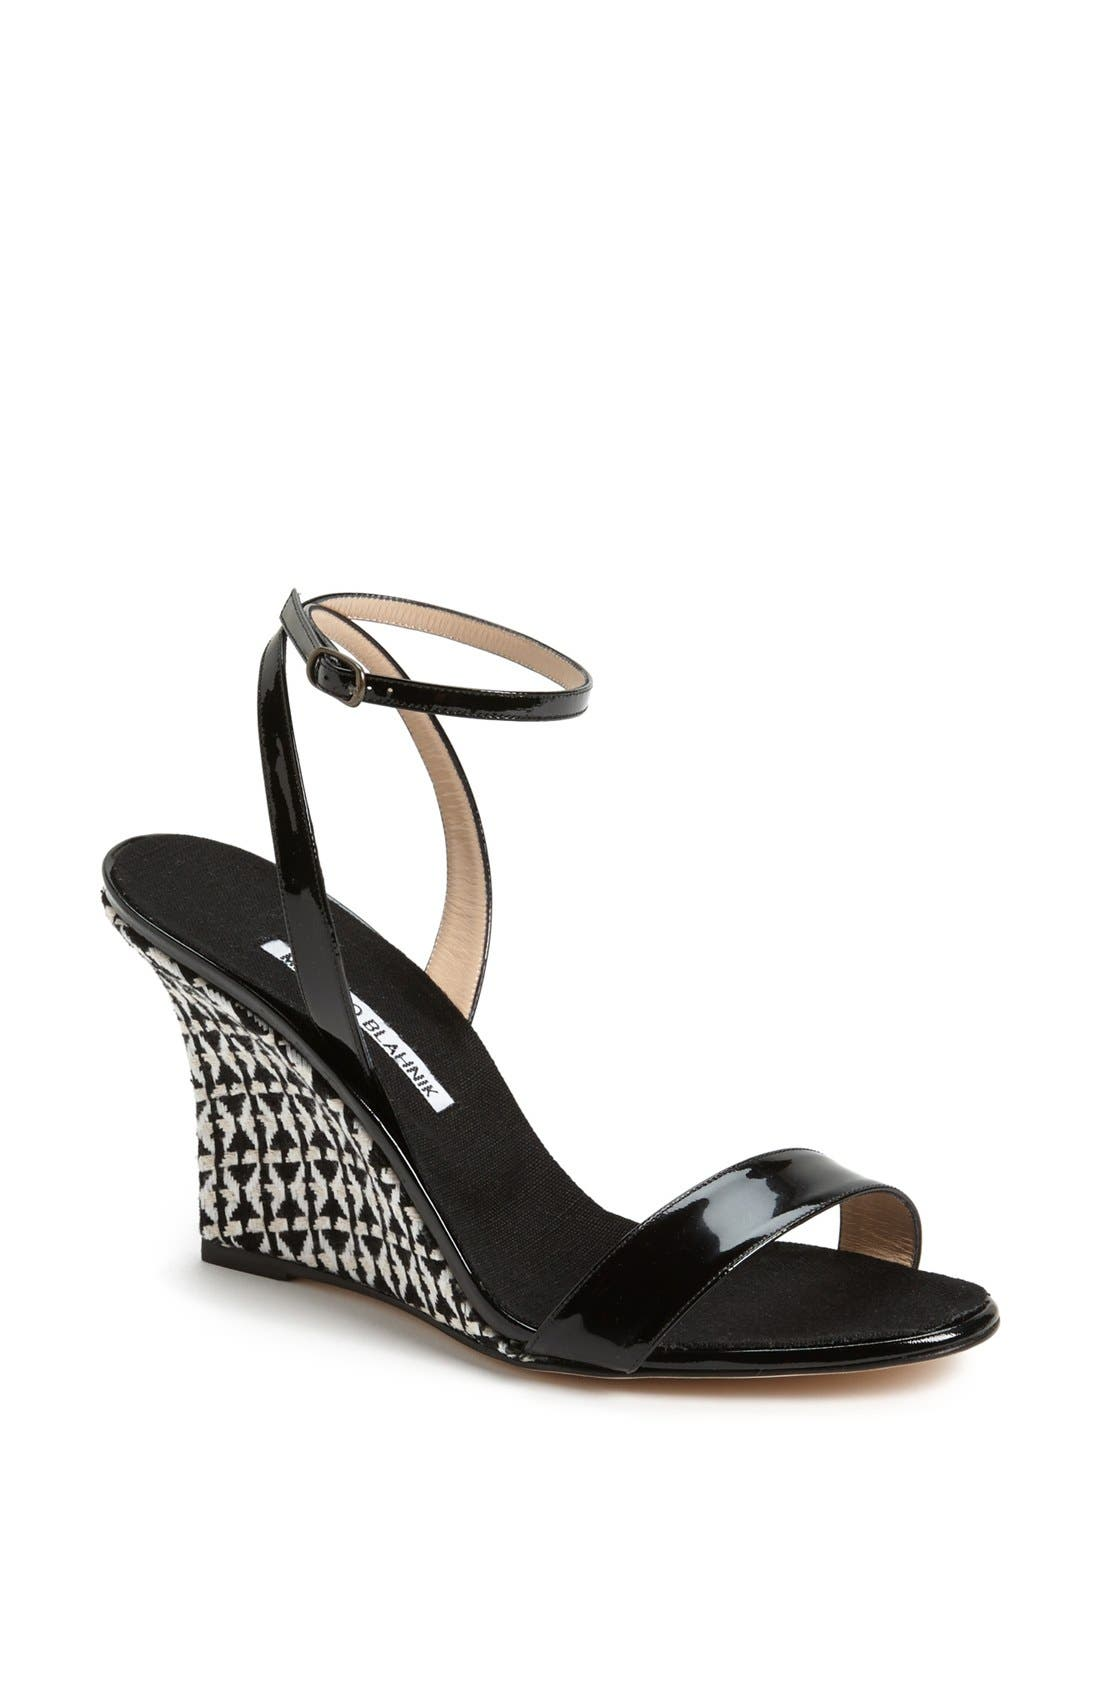 Alternate Image 1 Selected - Manolo Blahnik 'Ribera' Wedge Sandal